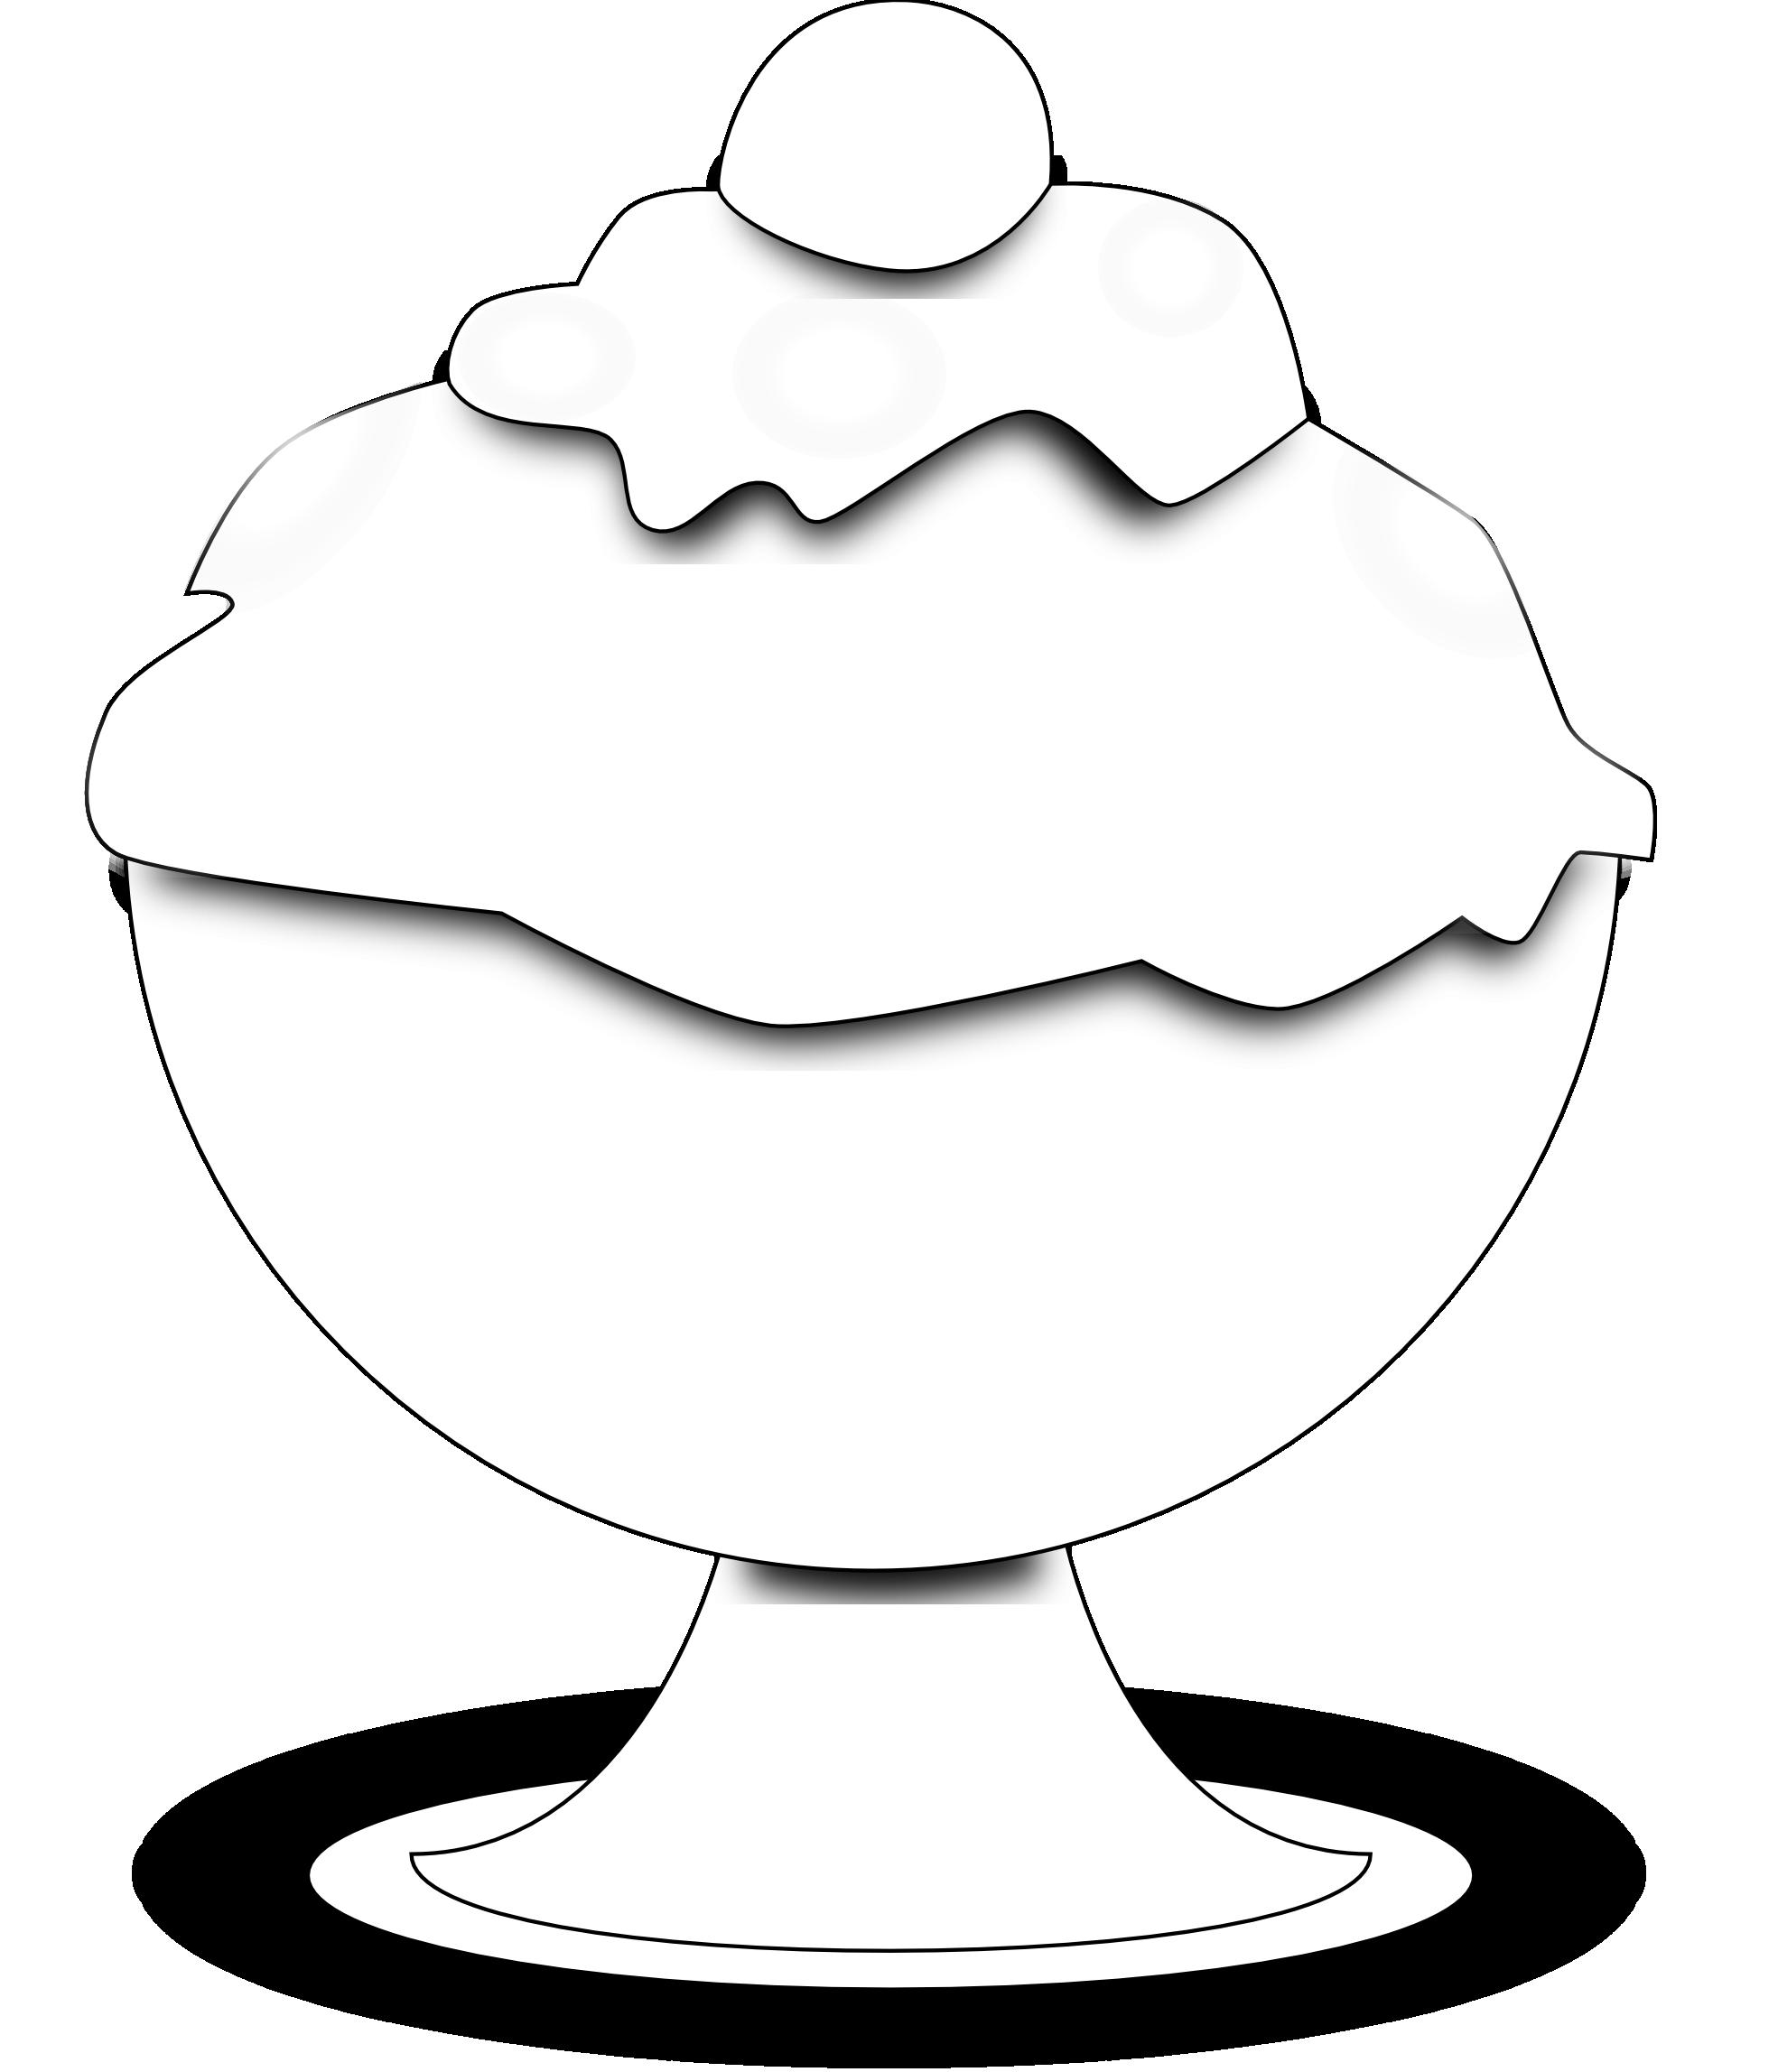 Ice cream  black and white ice cream clipart black and white free 6